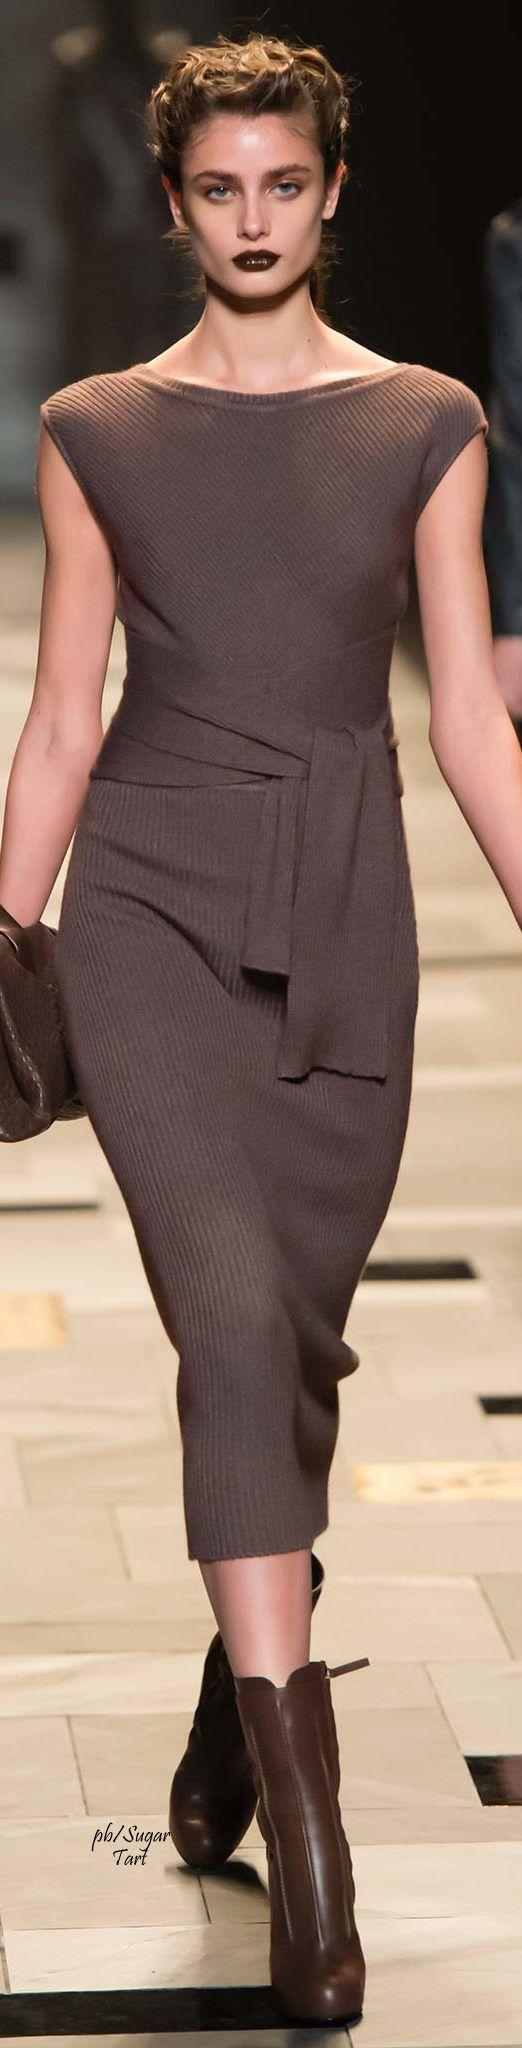 Trussardi Fall 2015 RTW #vestido #tubinho #malha #marrom #cinto #botas